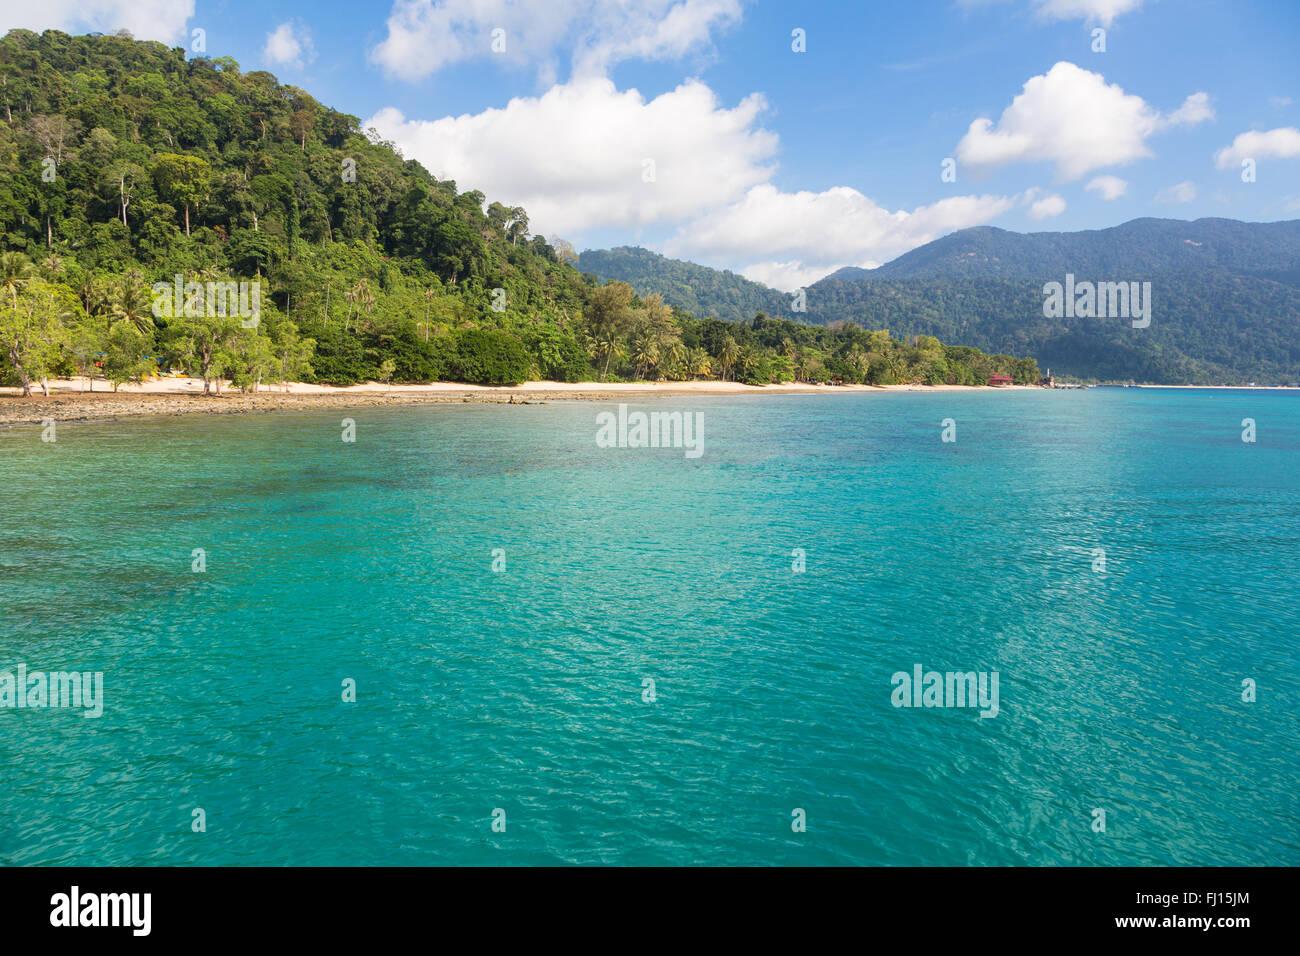 Tioman island is a stunning tropical island off the east coast of Malaysian Peninsula. - Stock Image